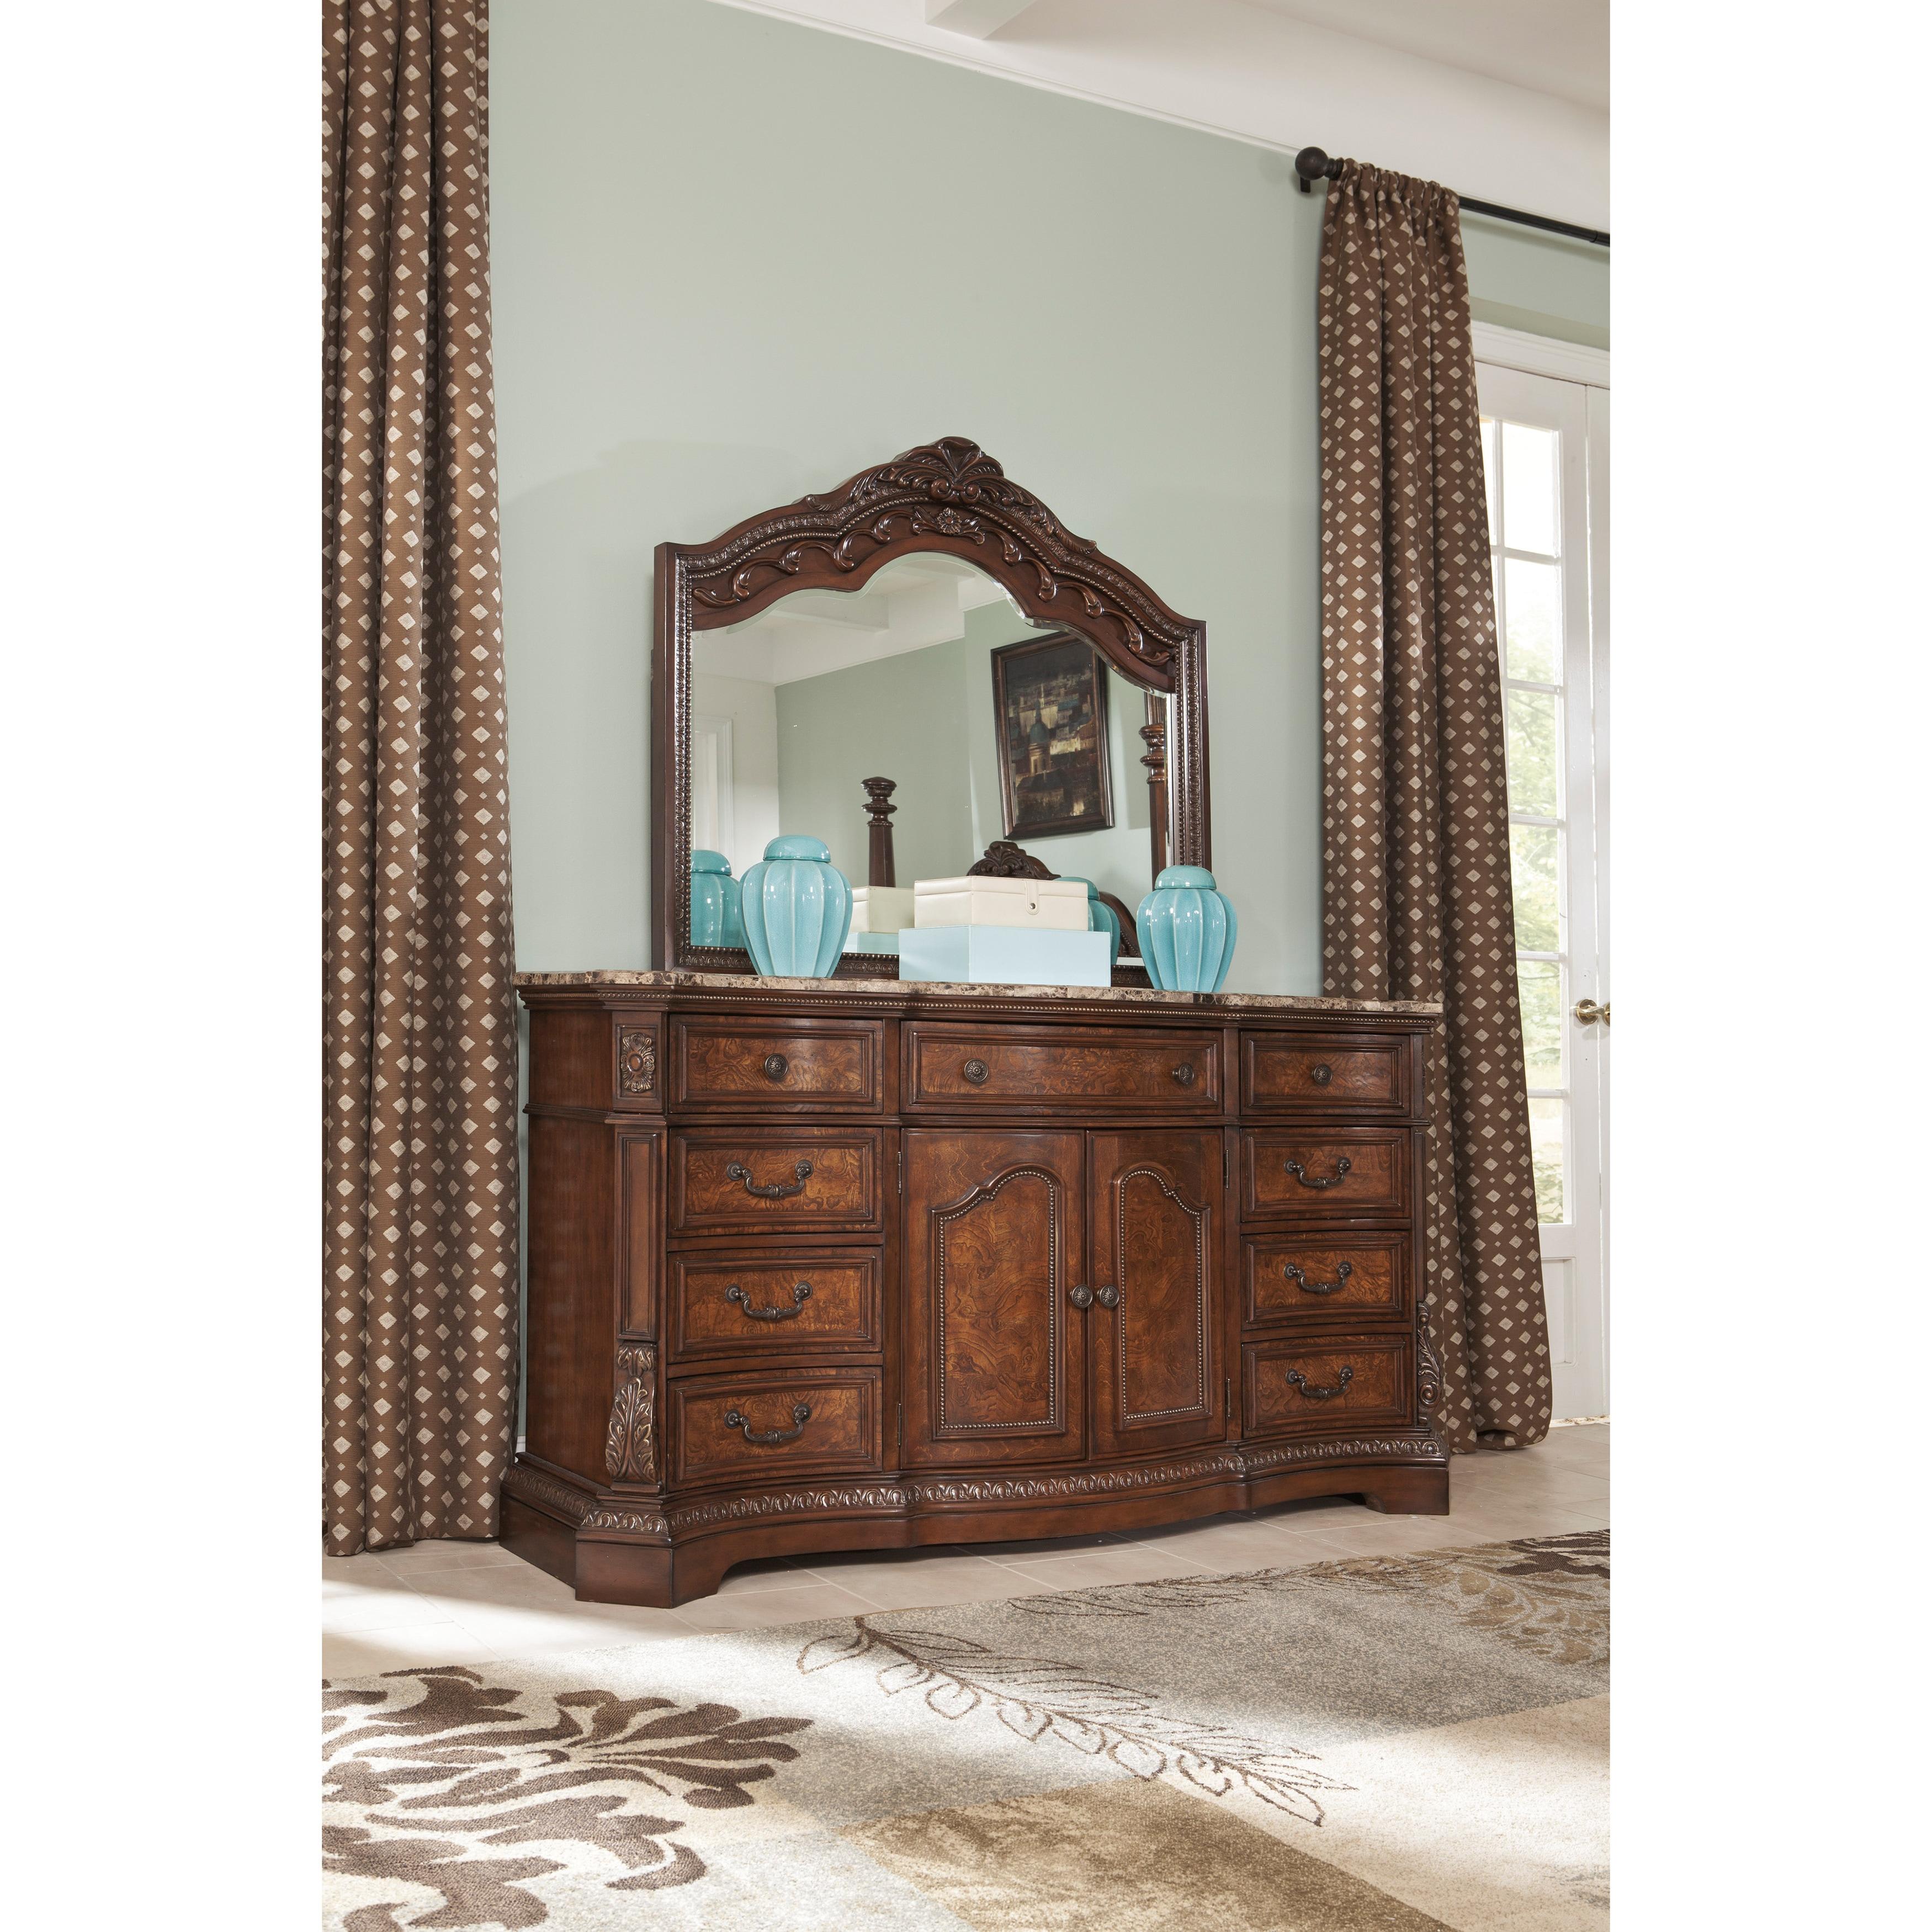 family the set mirrors tamara at mirrored dresser my home diy blog on